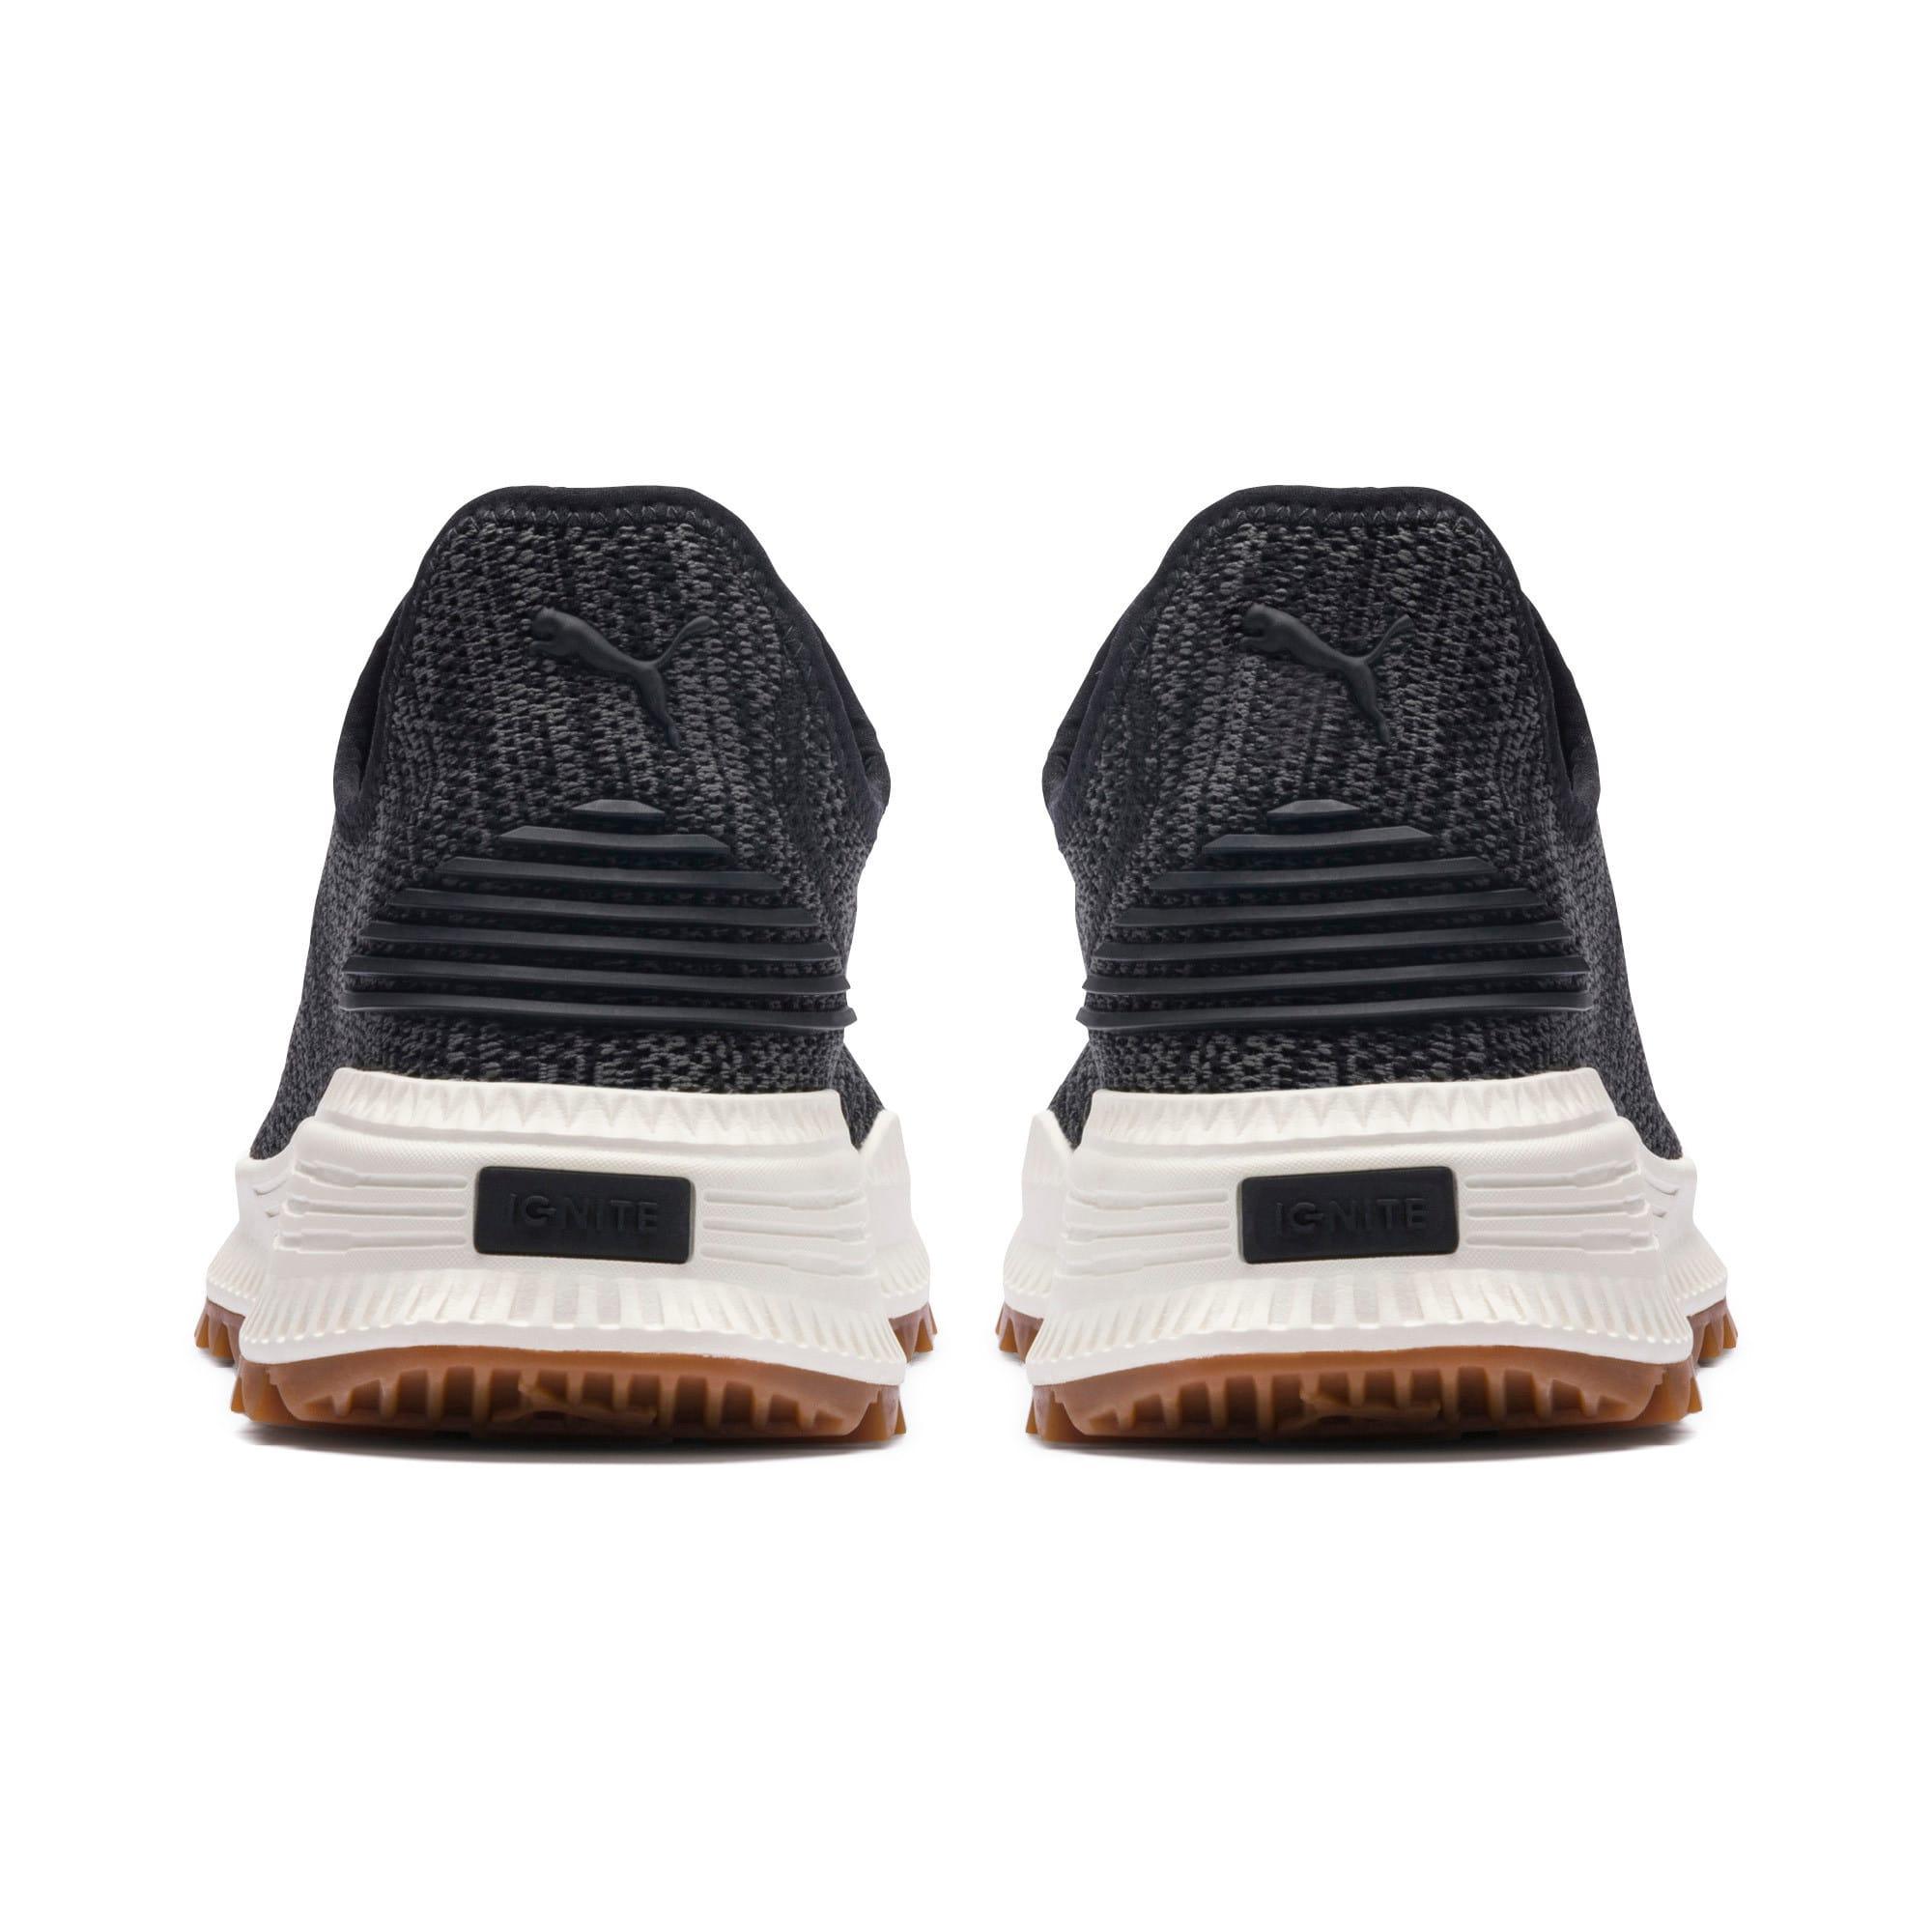 Thumbnail 4 of AVID Repellent Sneakers, Puma Black-Dark Shadow, medium